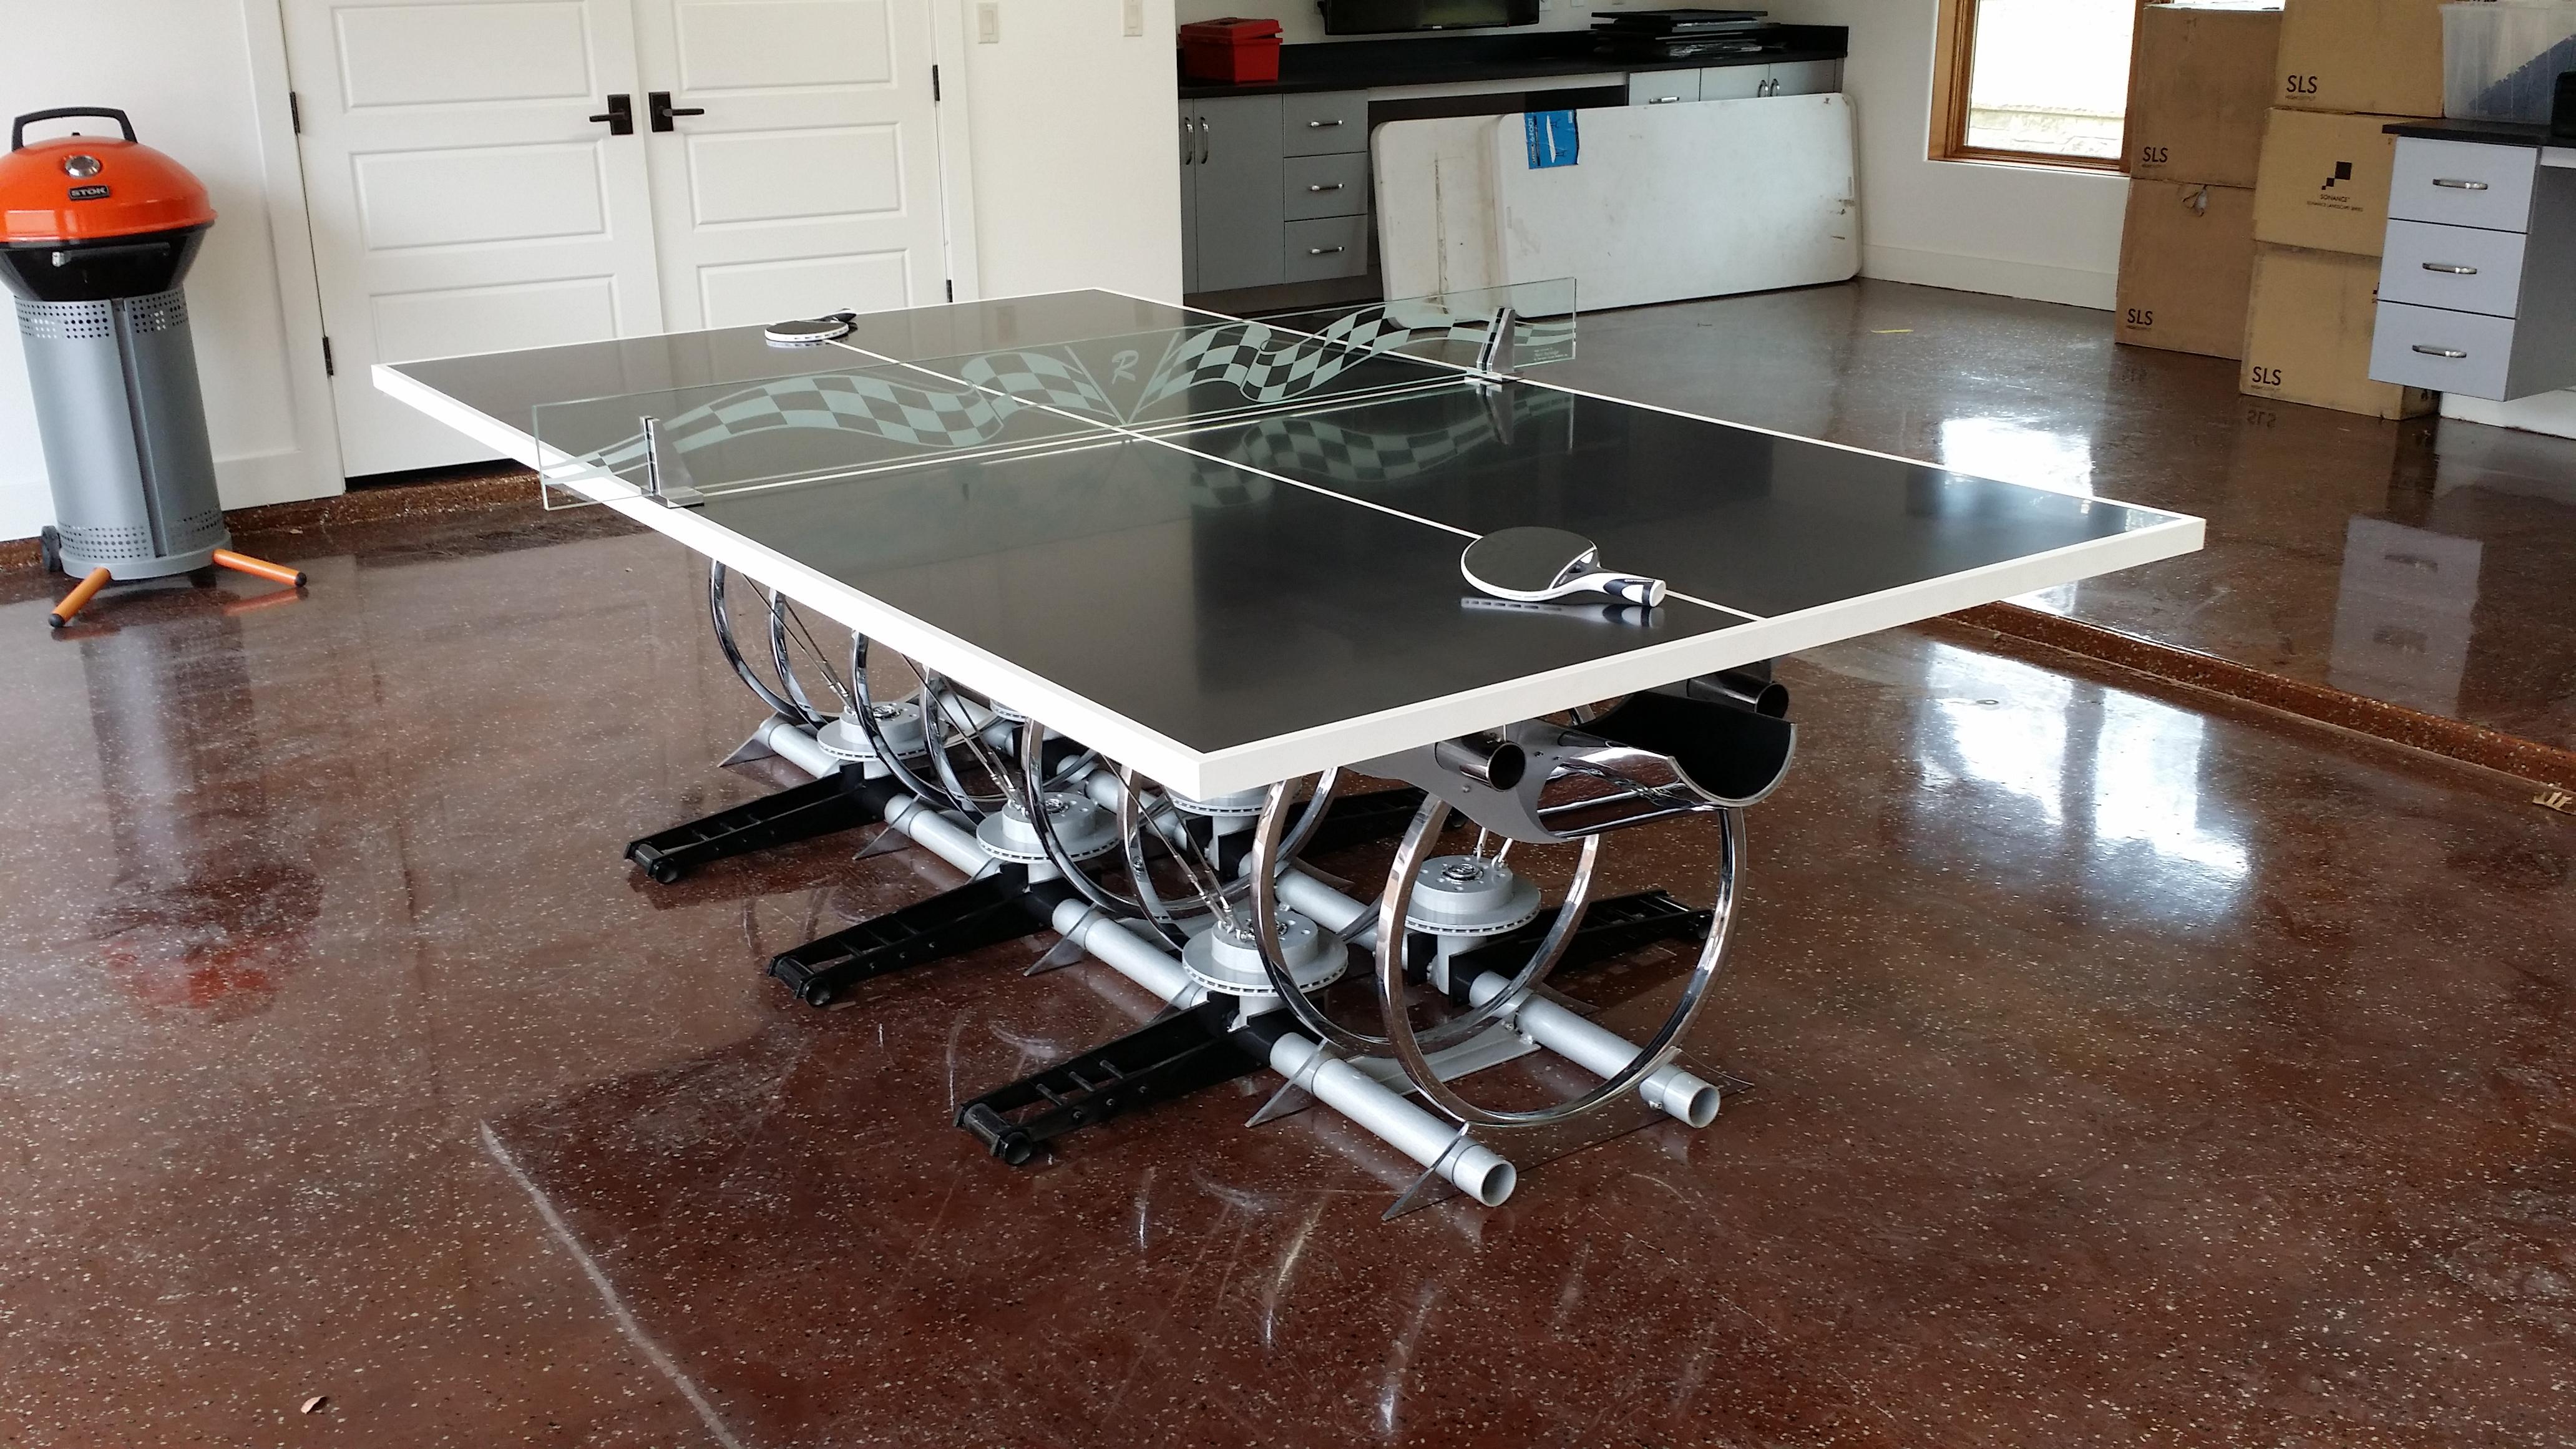 Automaniac Ping Pong Table #1!